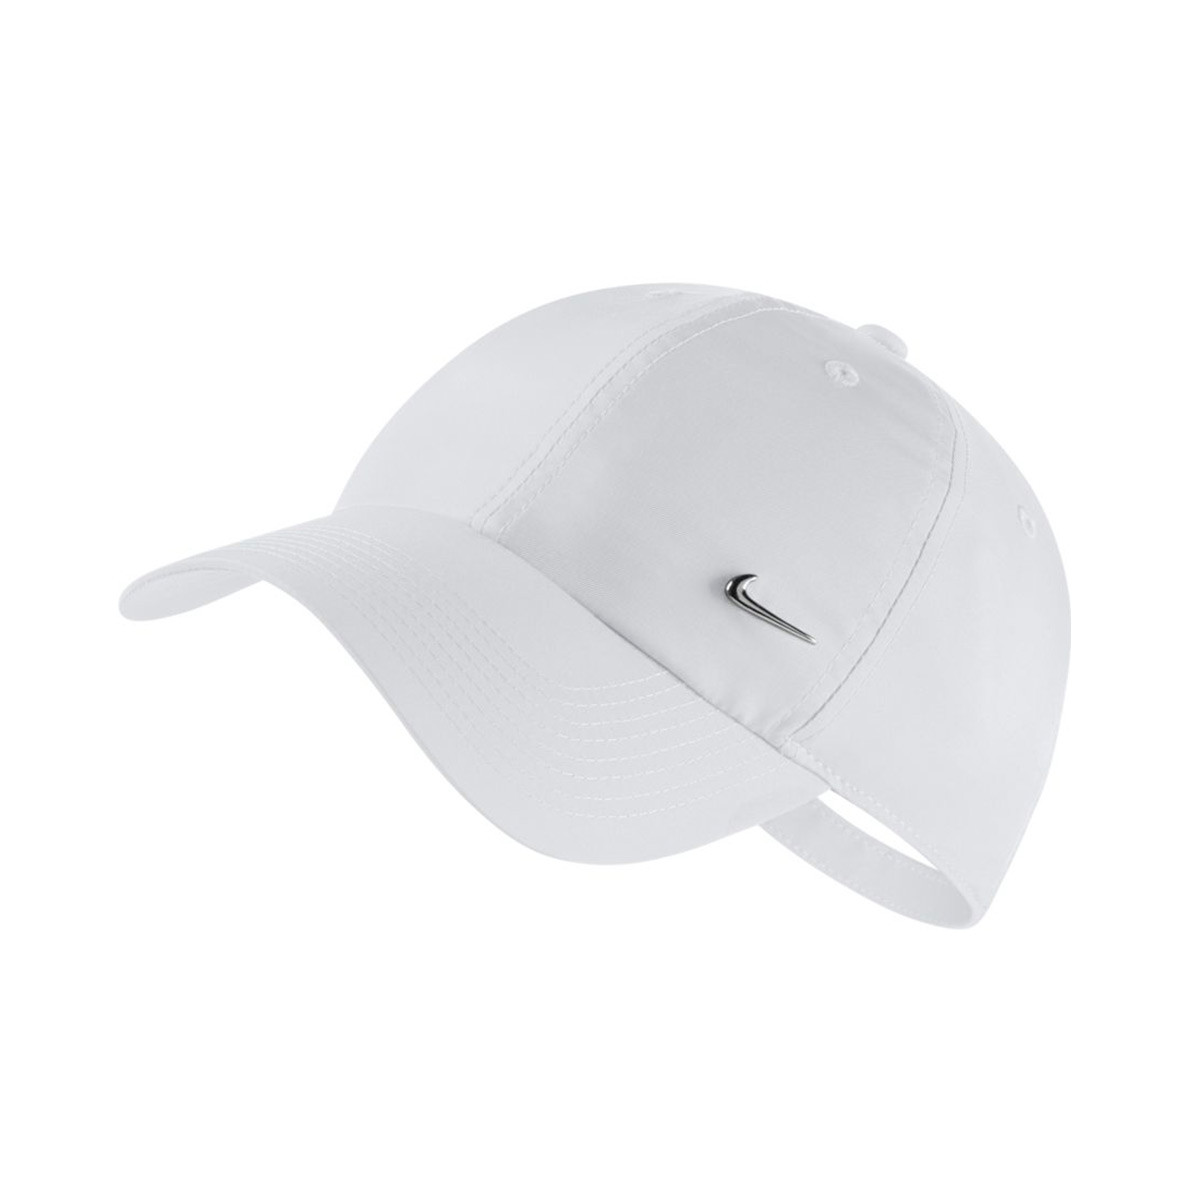 35c07dabd1 Casquette Nike Sportswear Heritage86 White-Metallic silver - Boutique de  football Fútbol Emotion